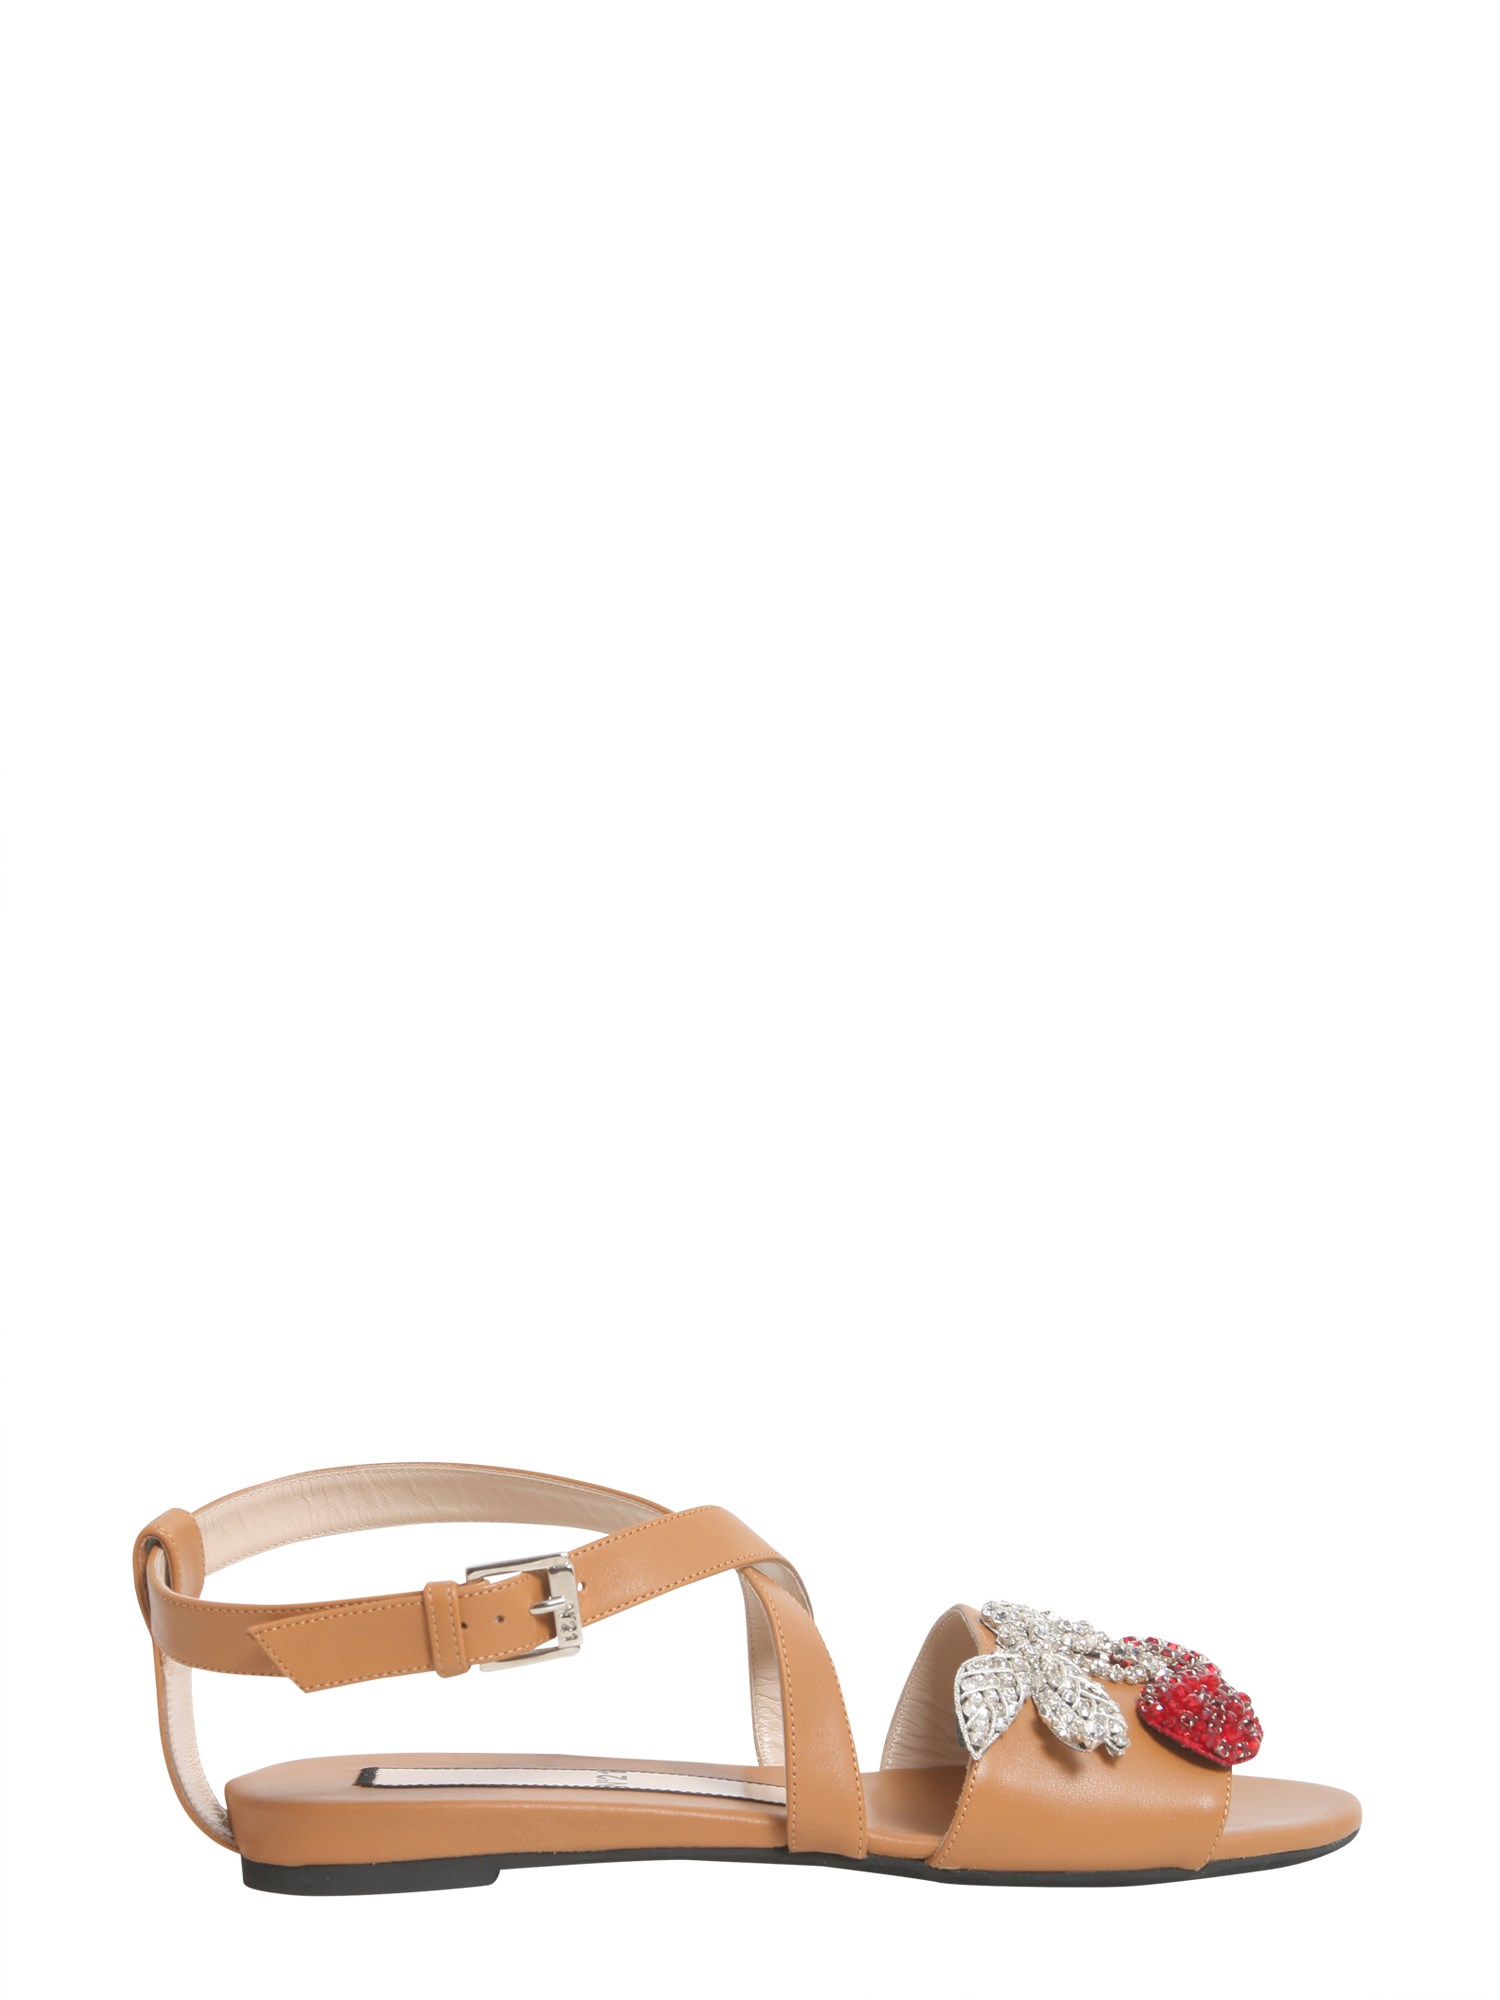 n°21 cherry pin sandals